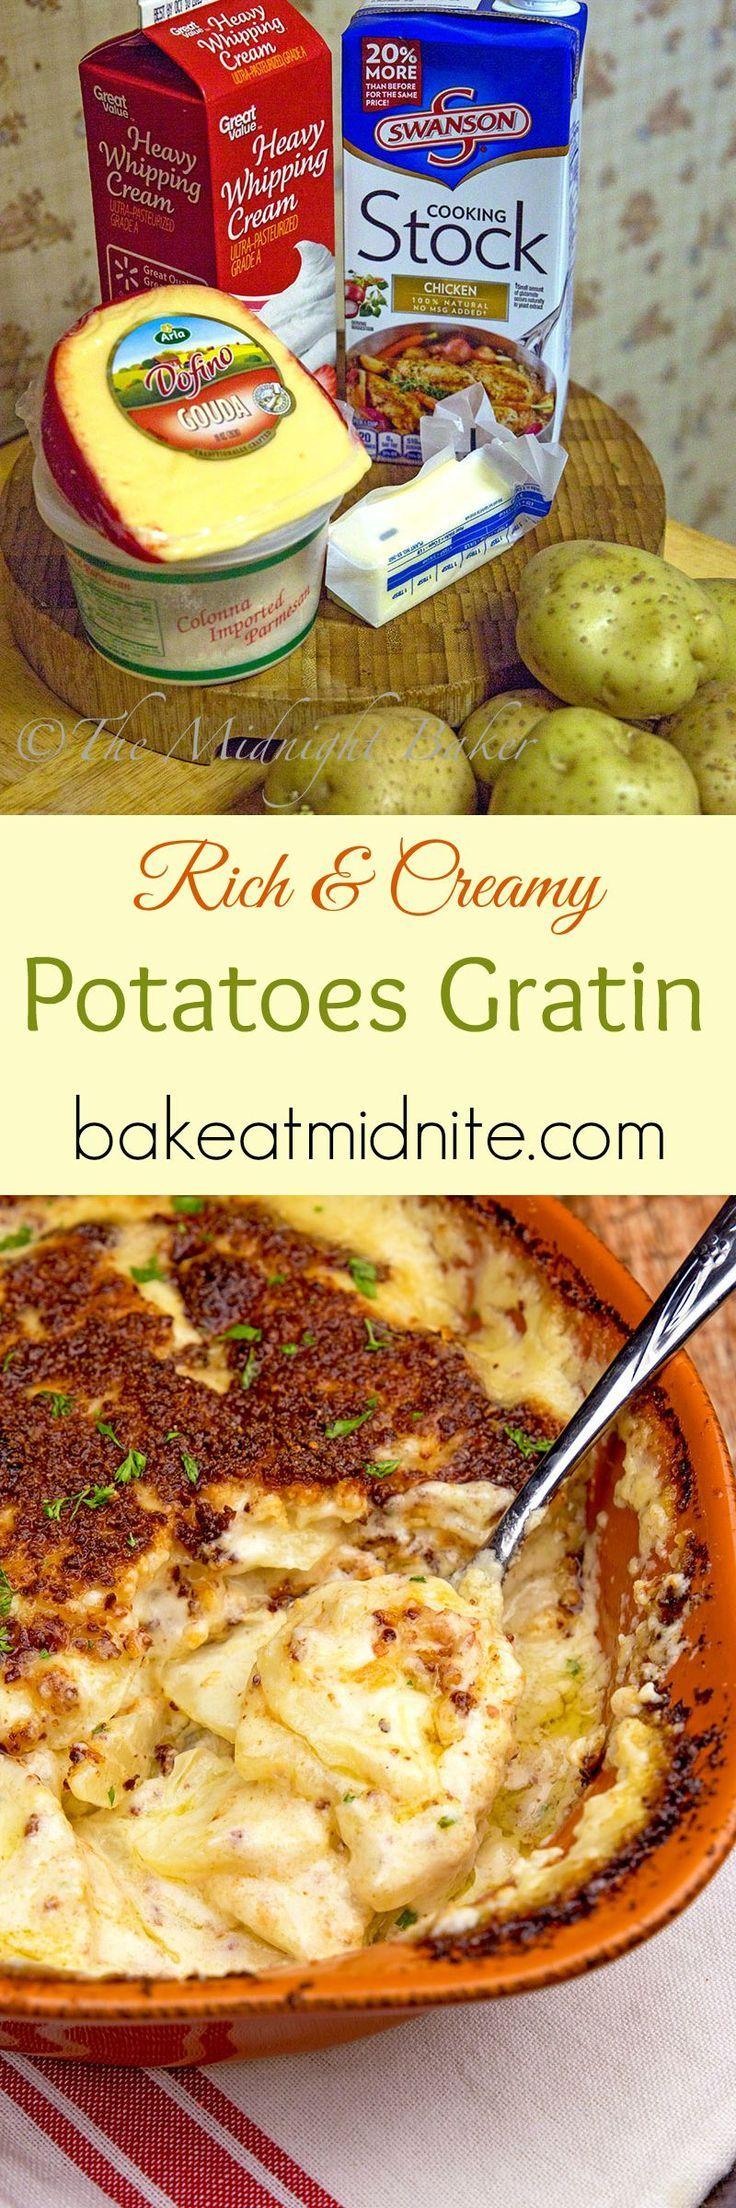 Scalloped-Potatoes-Gratin | bakeatmidnite.com | #potatoes #sidedishes #recipe